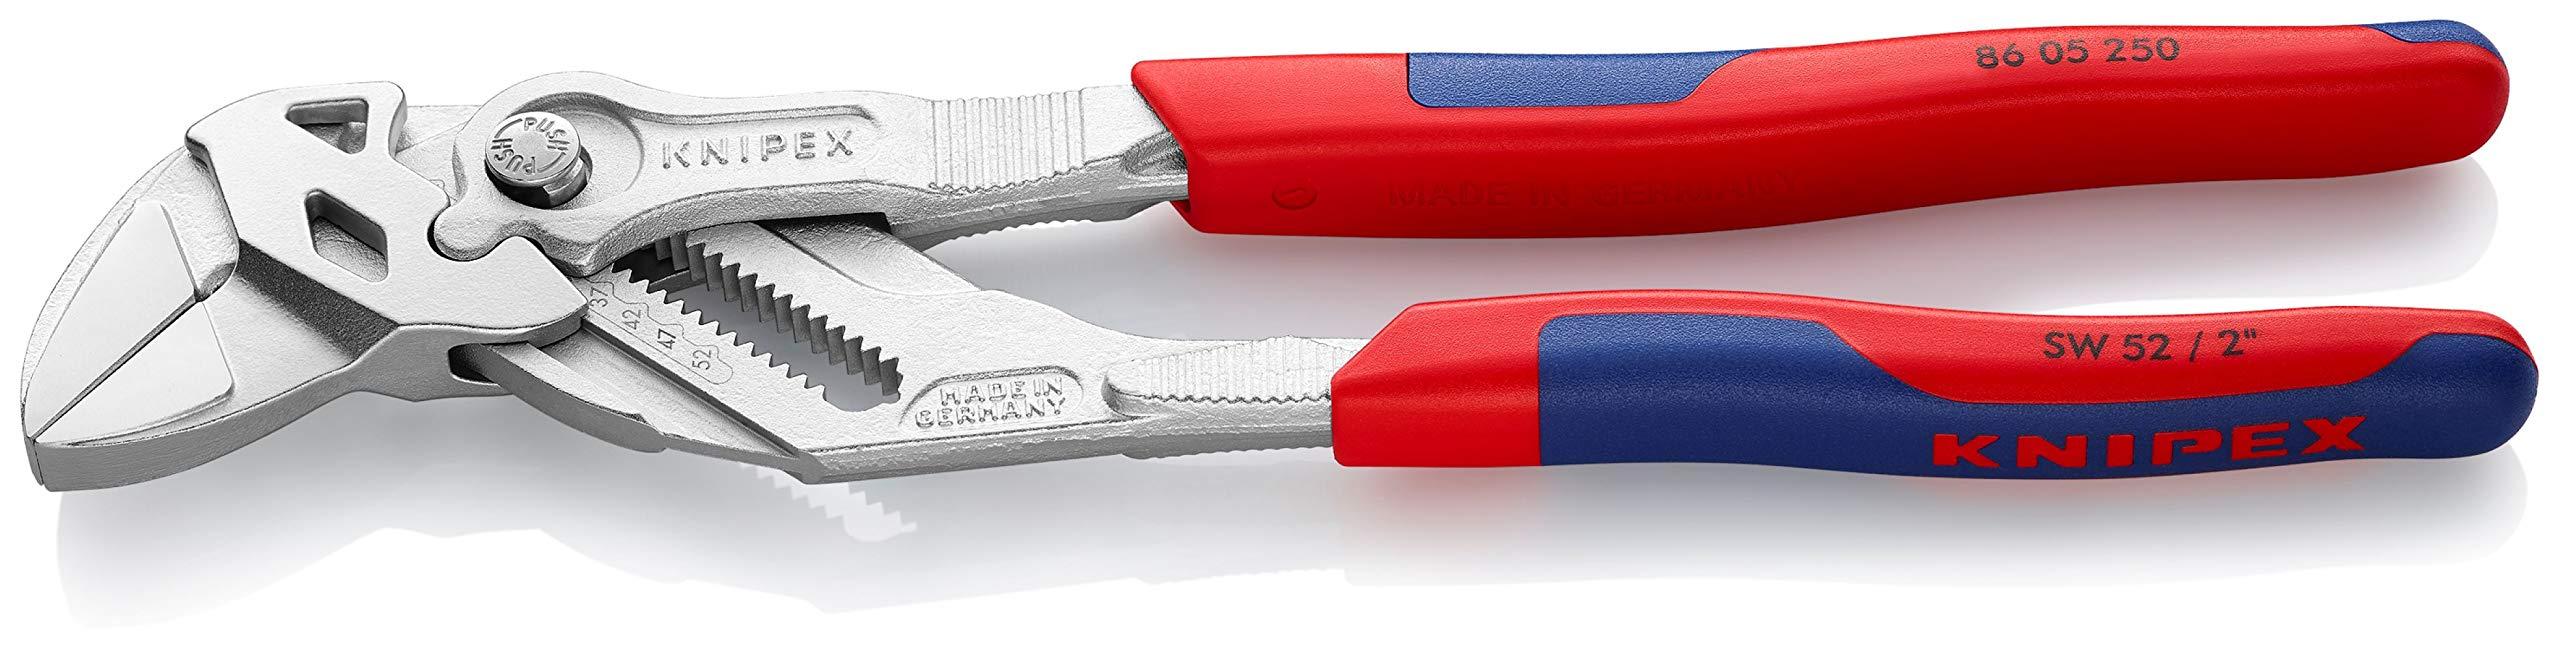 Silver Wera 05008725001 Screwdriver for Phillips Screws 350 PH-2x200mm